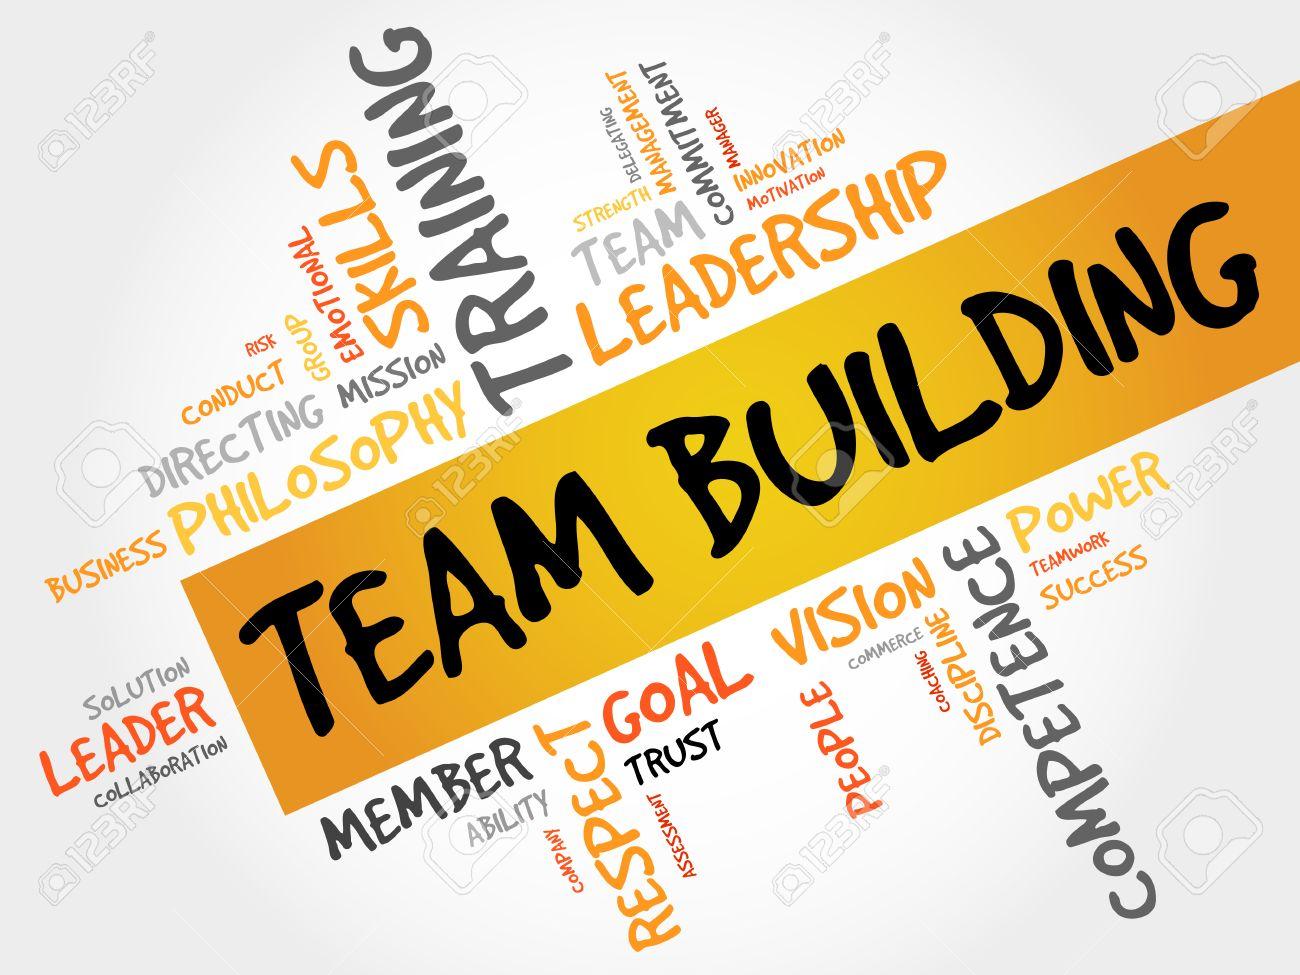 TEAM BUILDING word cloud, business concept - 52043014